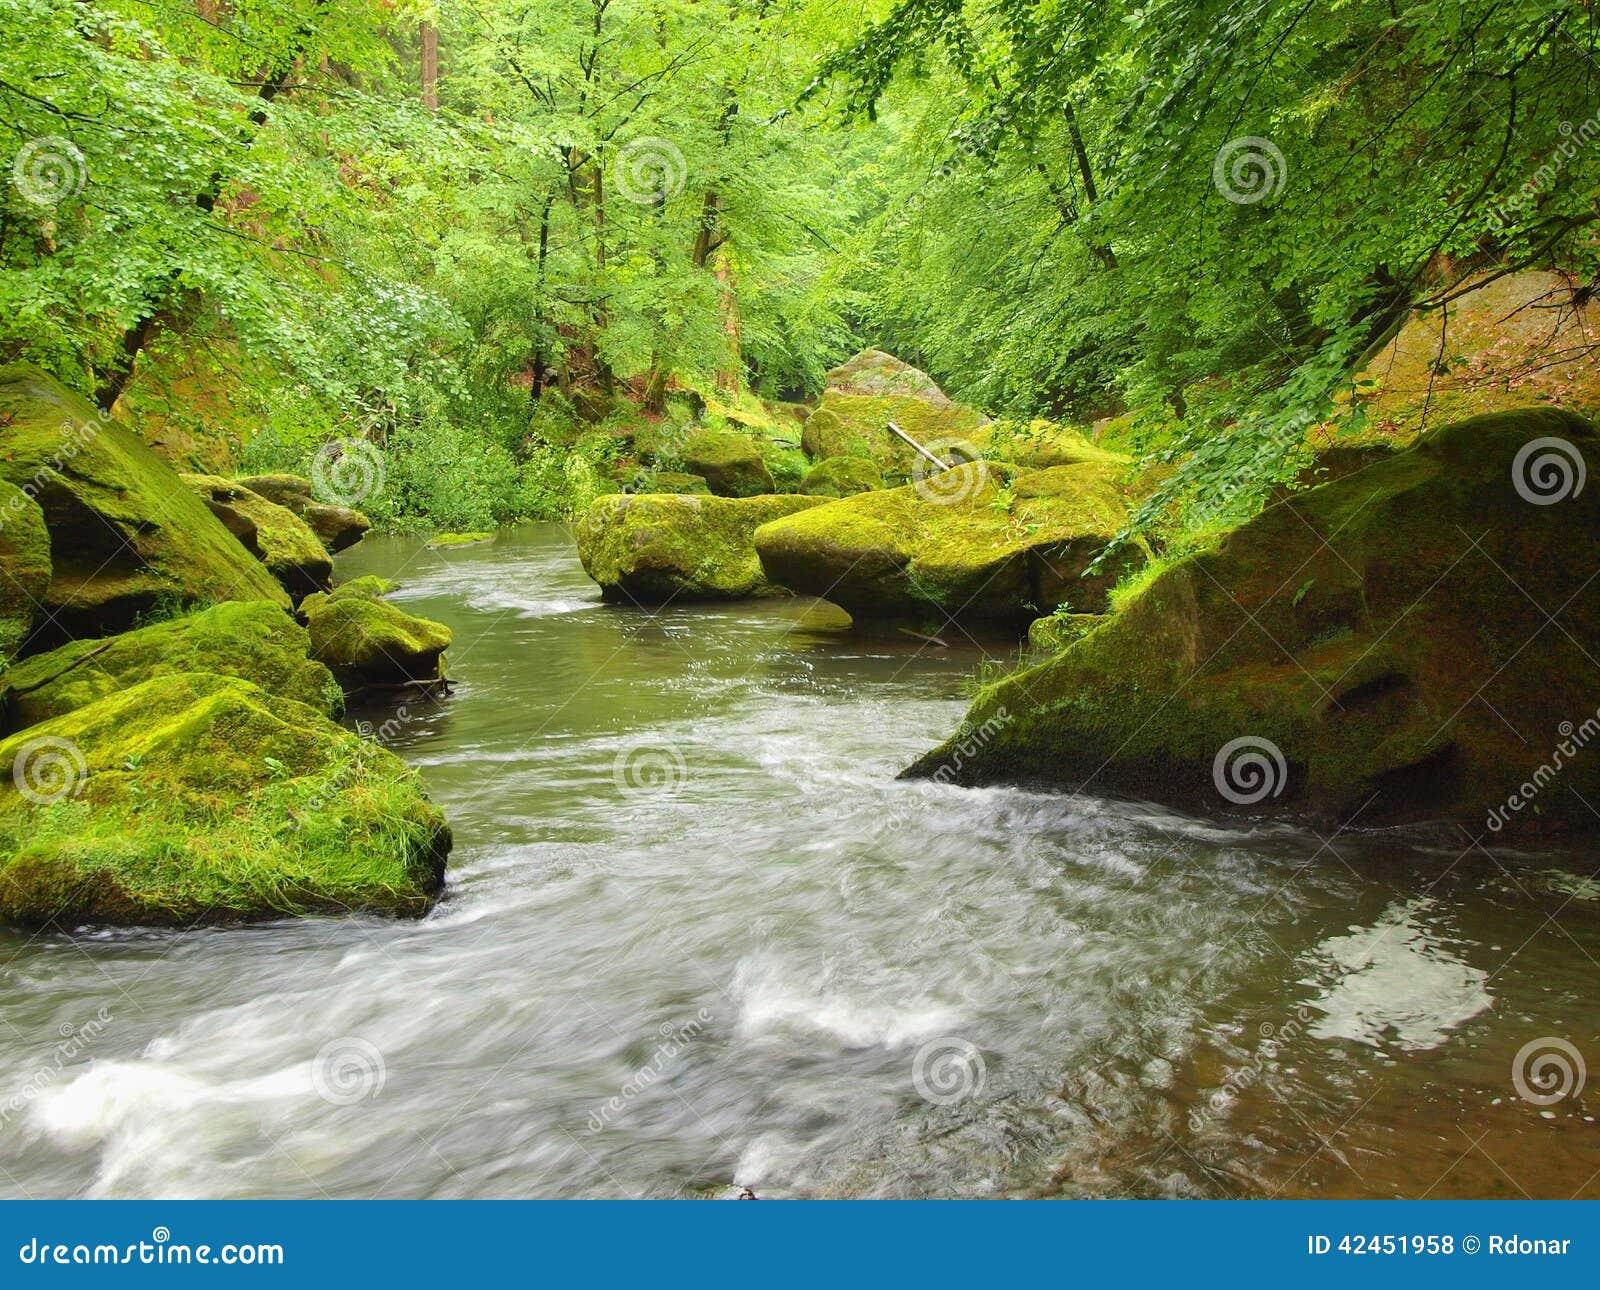 Wasserspiegel unter frischen grünen Bäumen in Gebirgsfluss Frische Frühlingsluft am Abend